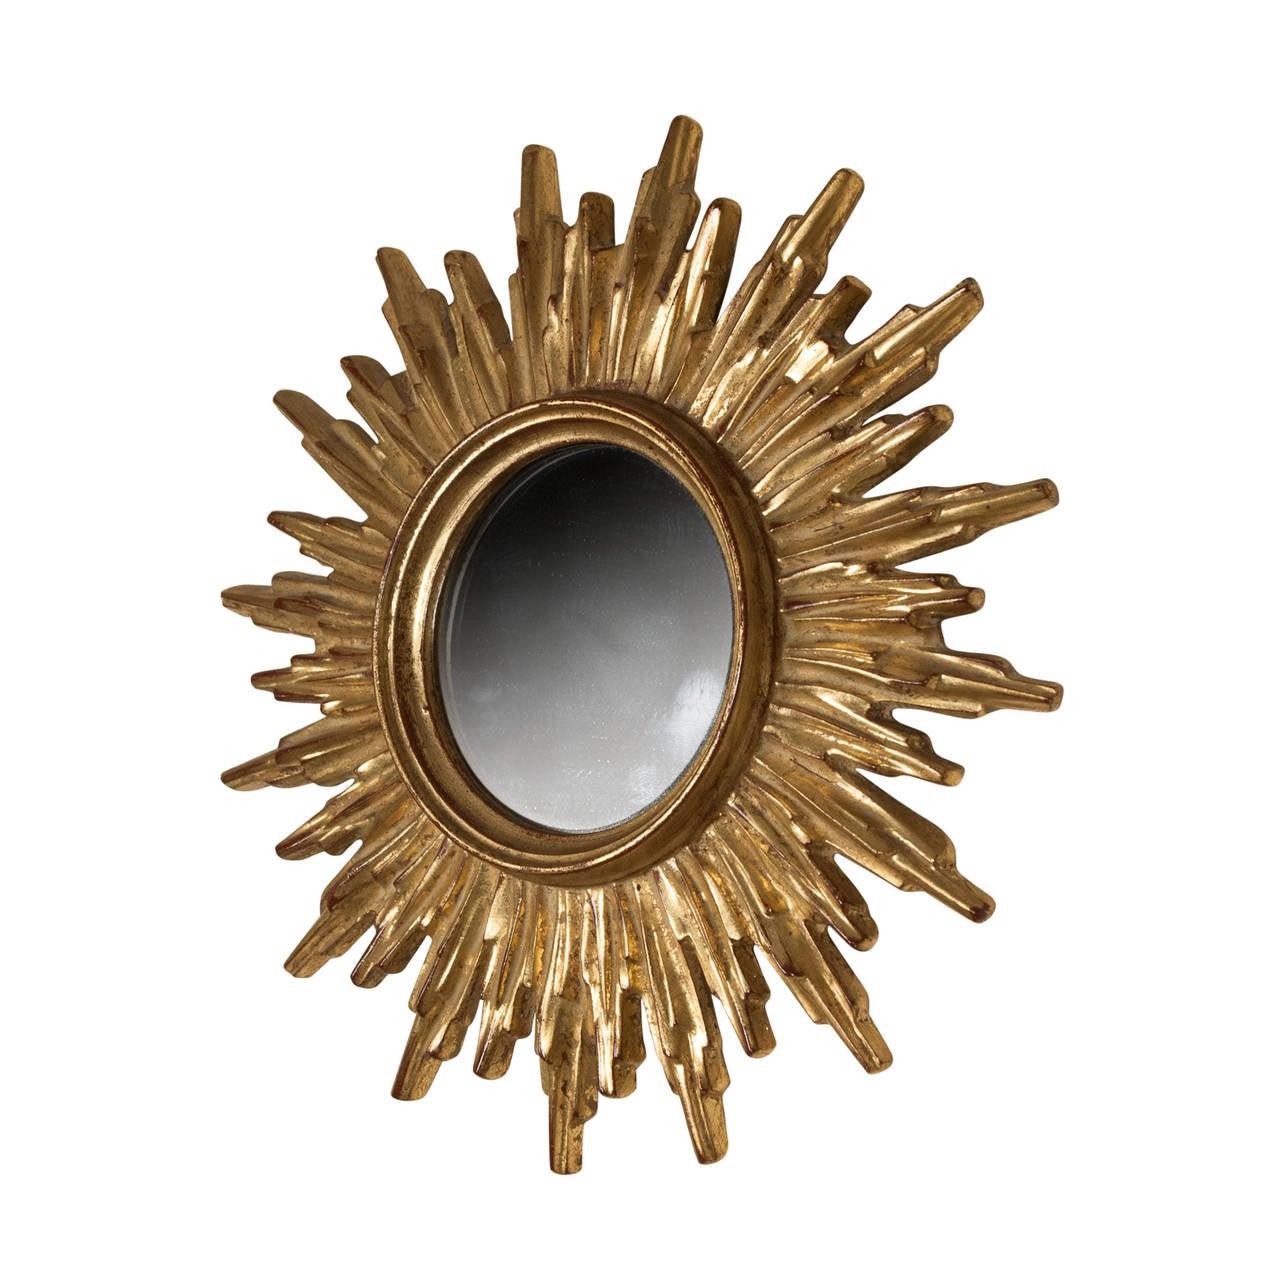 Small sunburst mirror at 1stdibs for Sunburst mirror